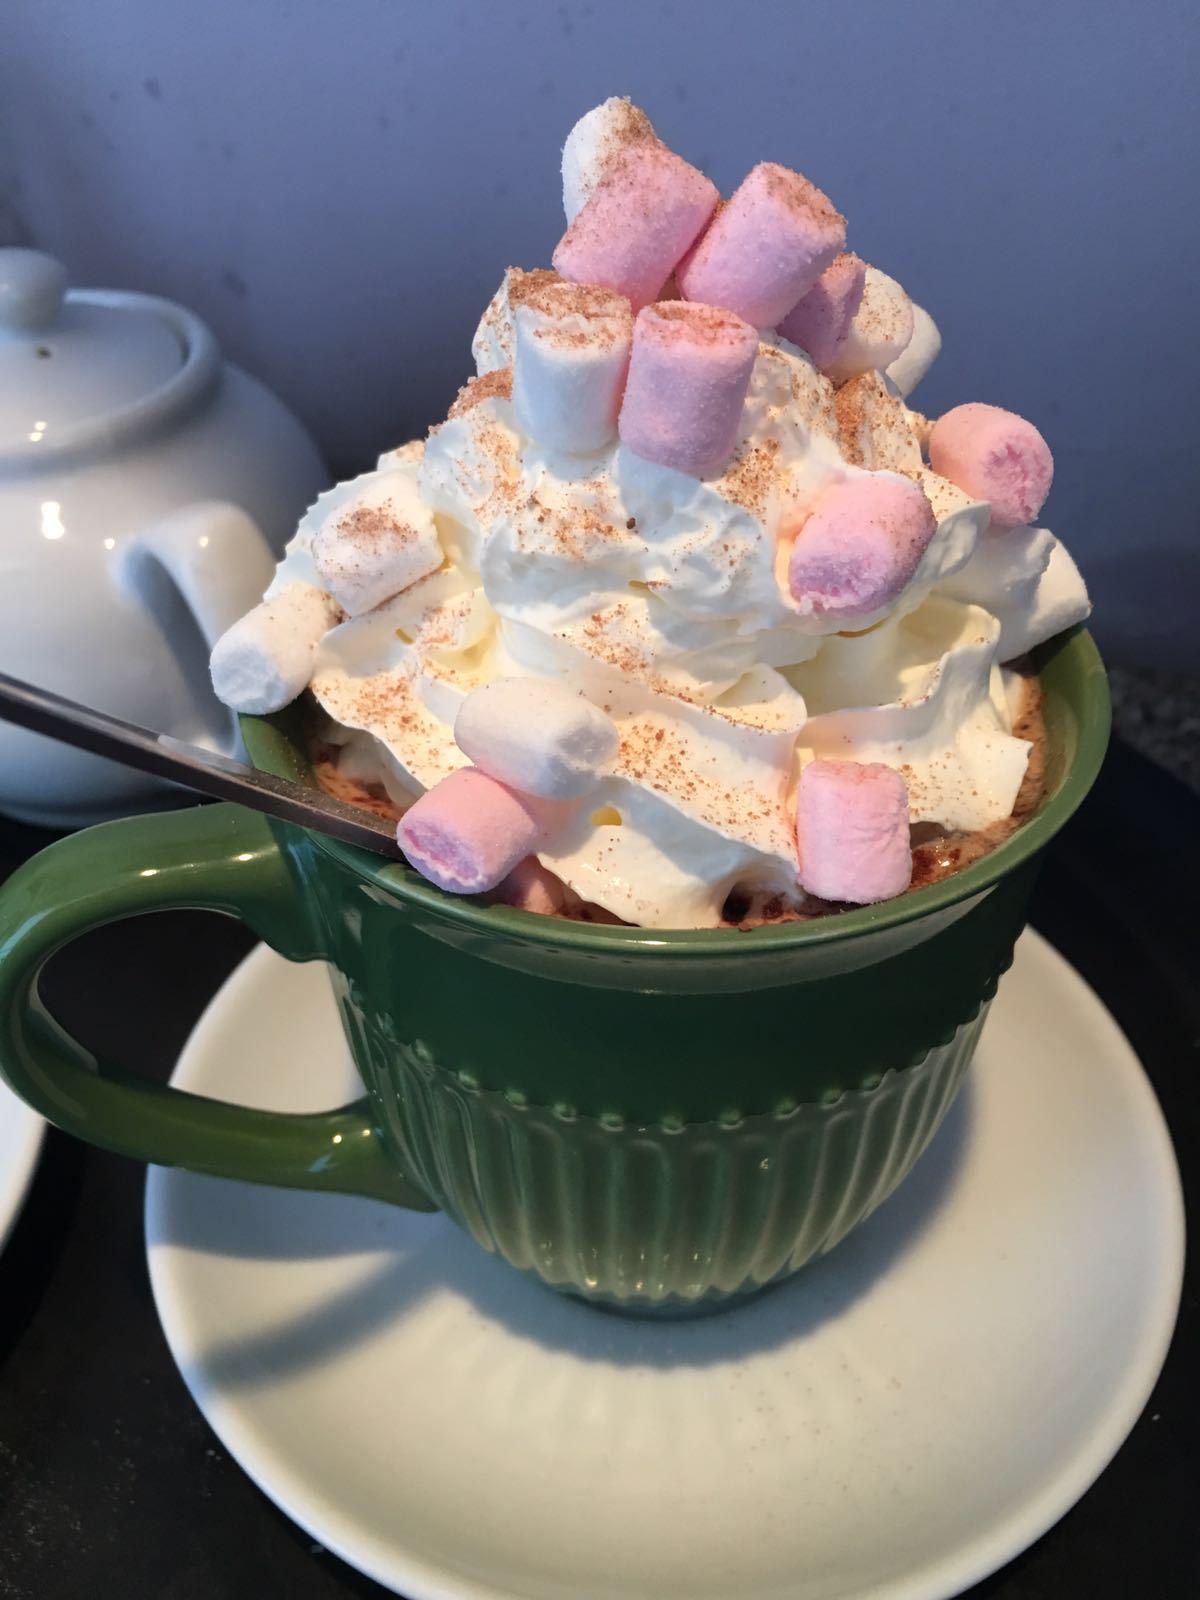 Deluxe Hot Chocolate